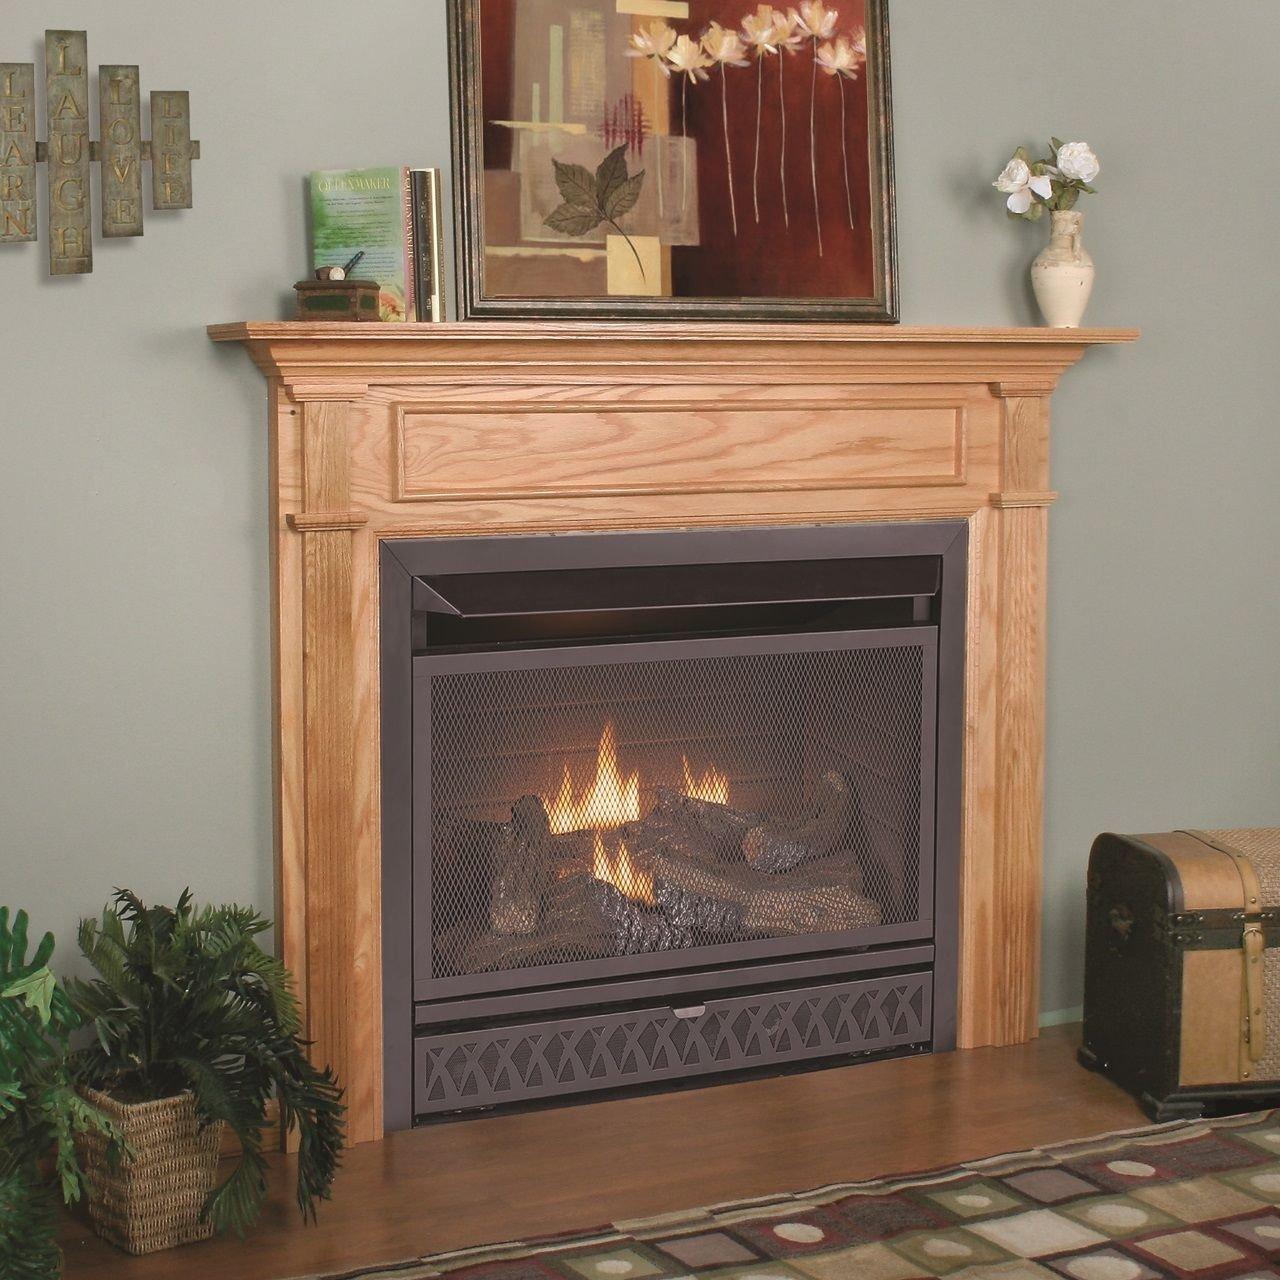 amazon com procom vent free dual fuel fireplace insert model